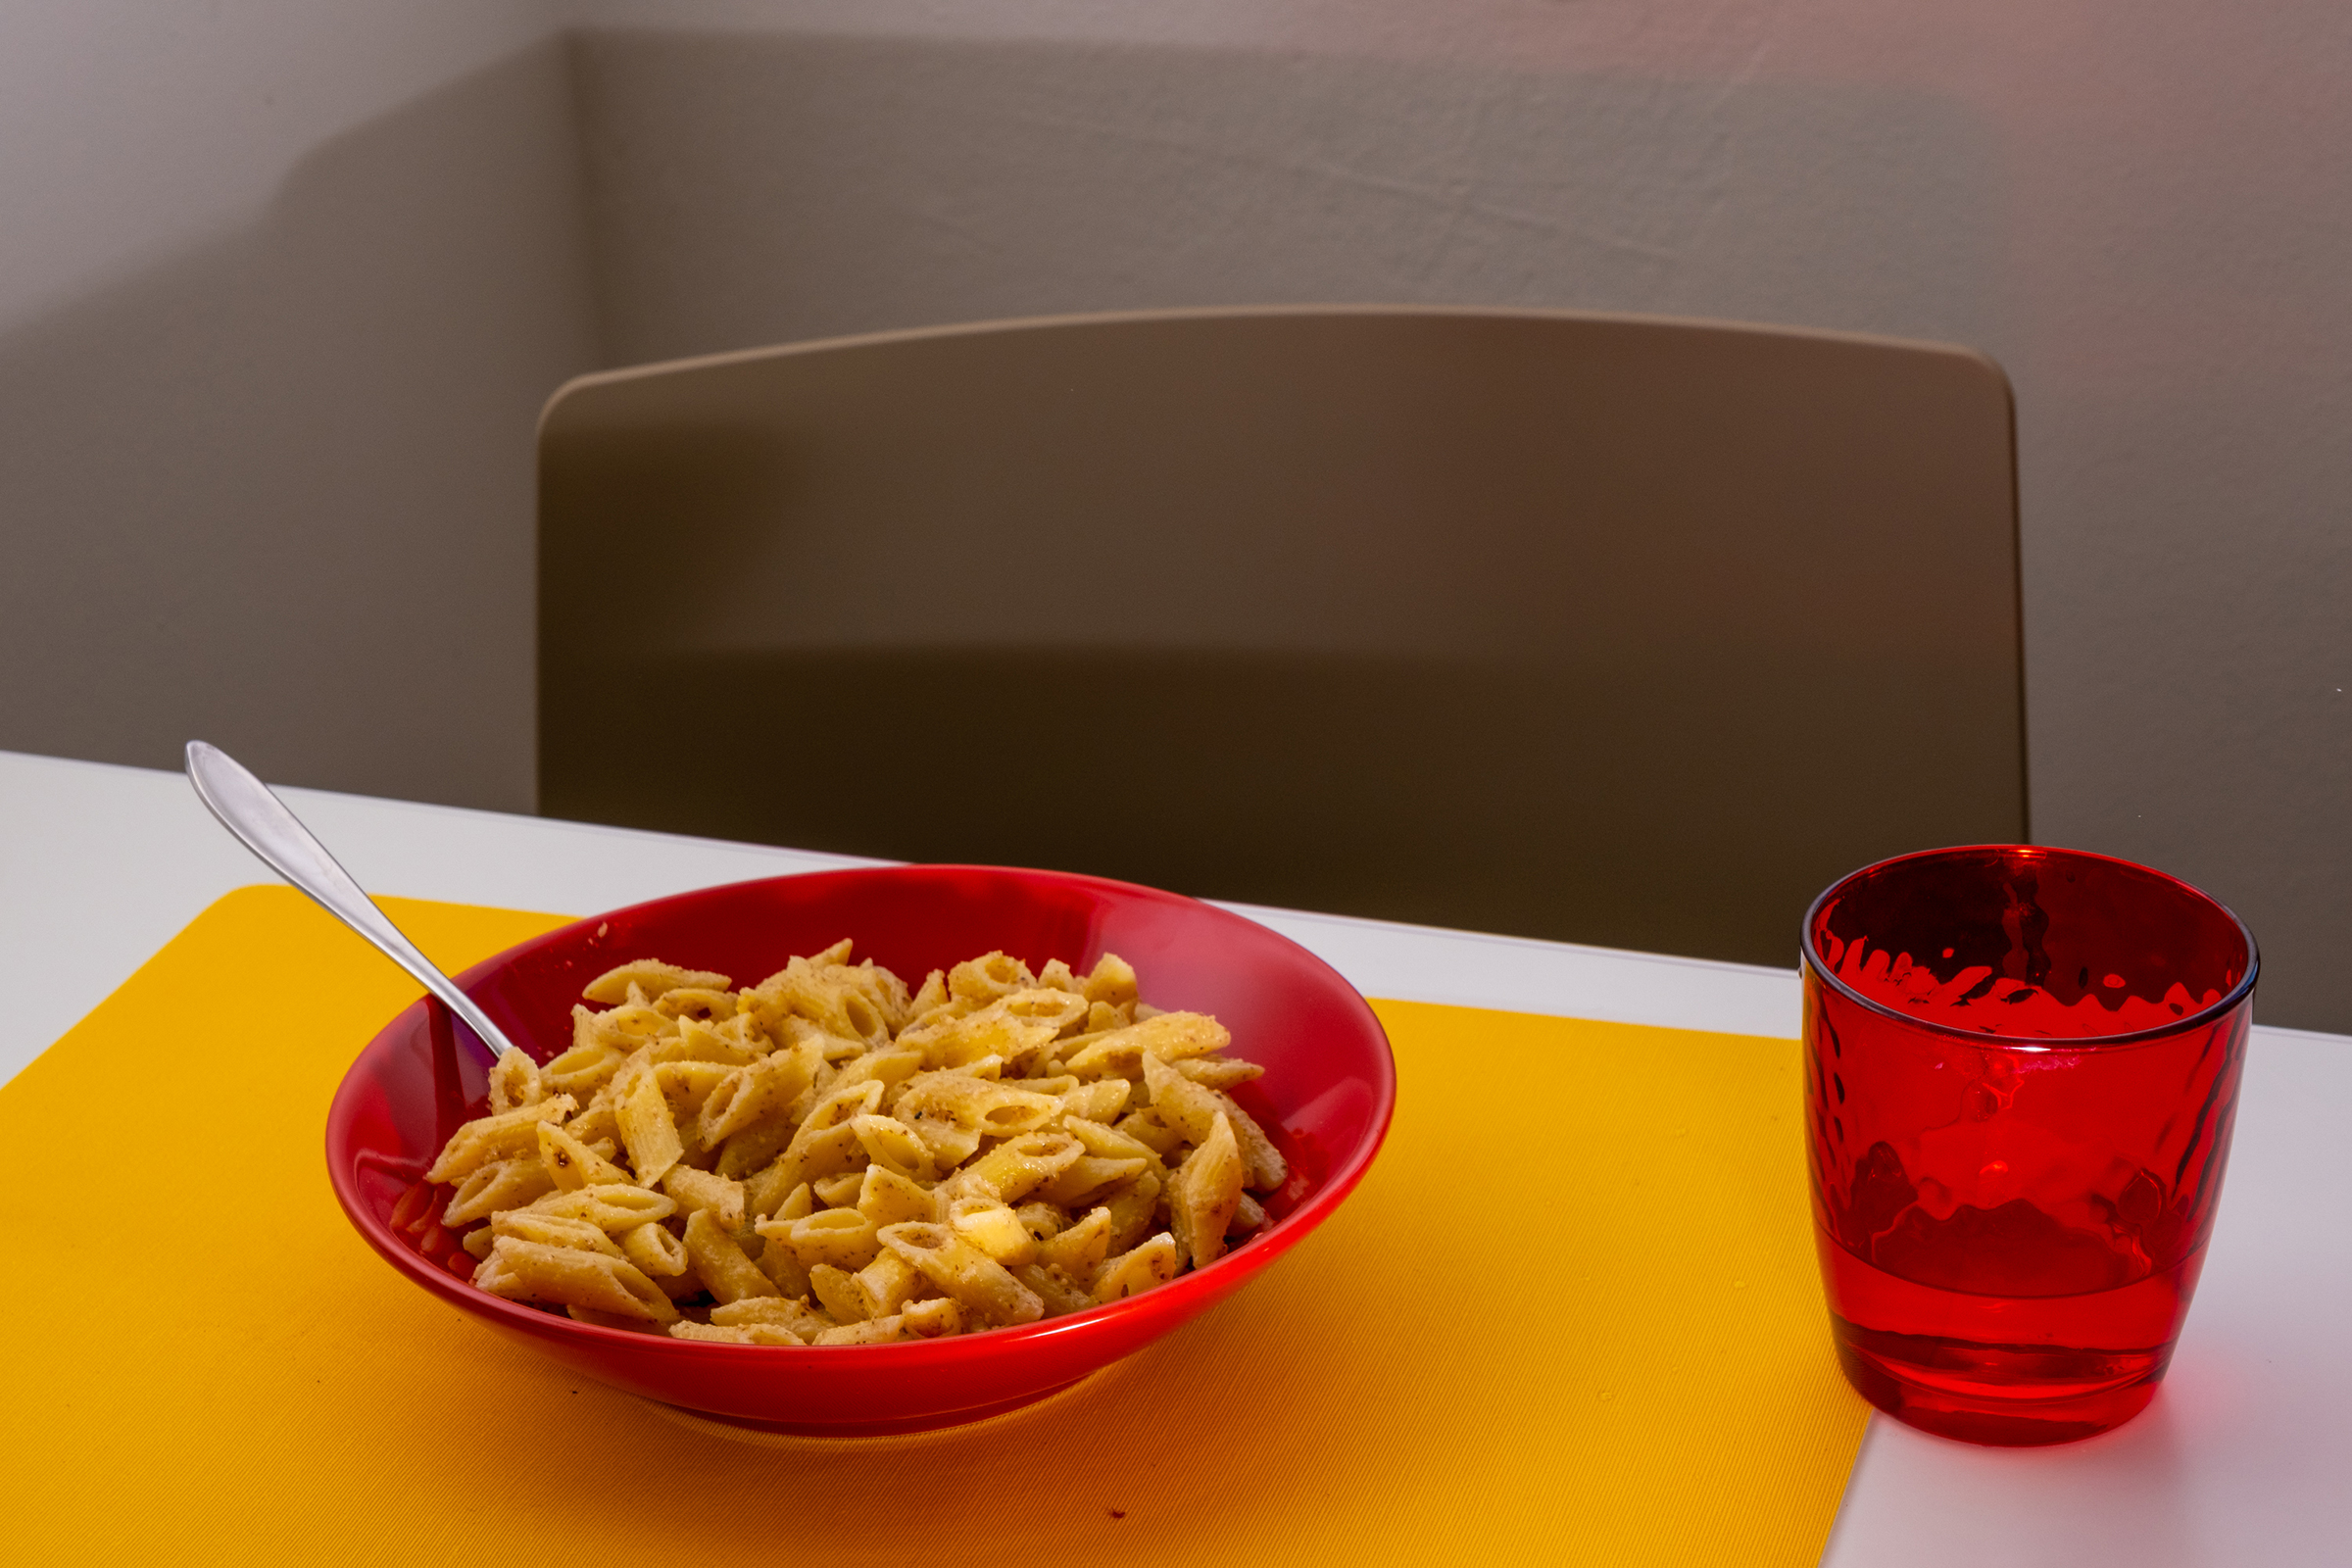 2:20 P.M. Eating pasta